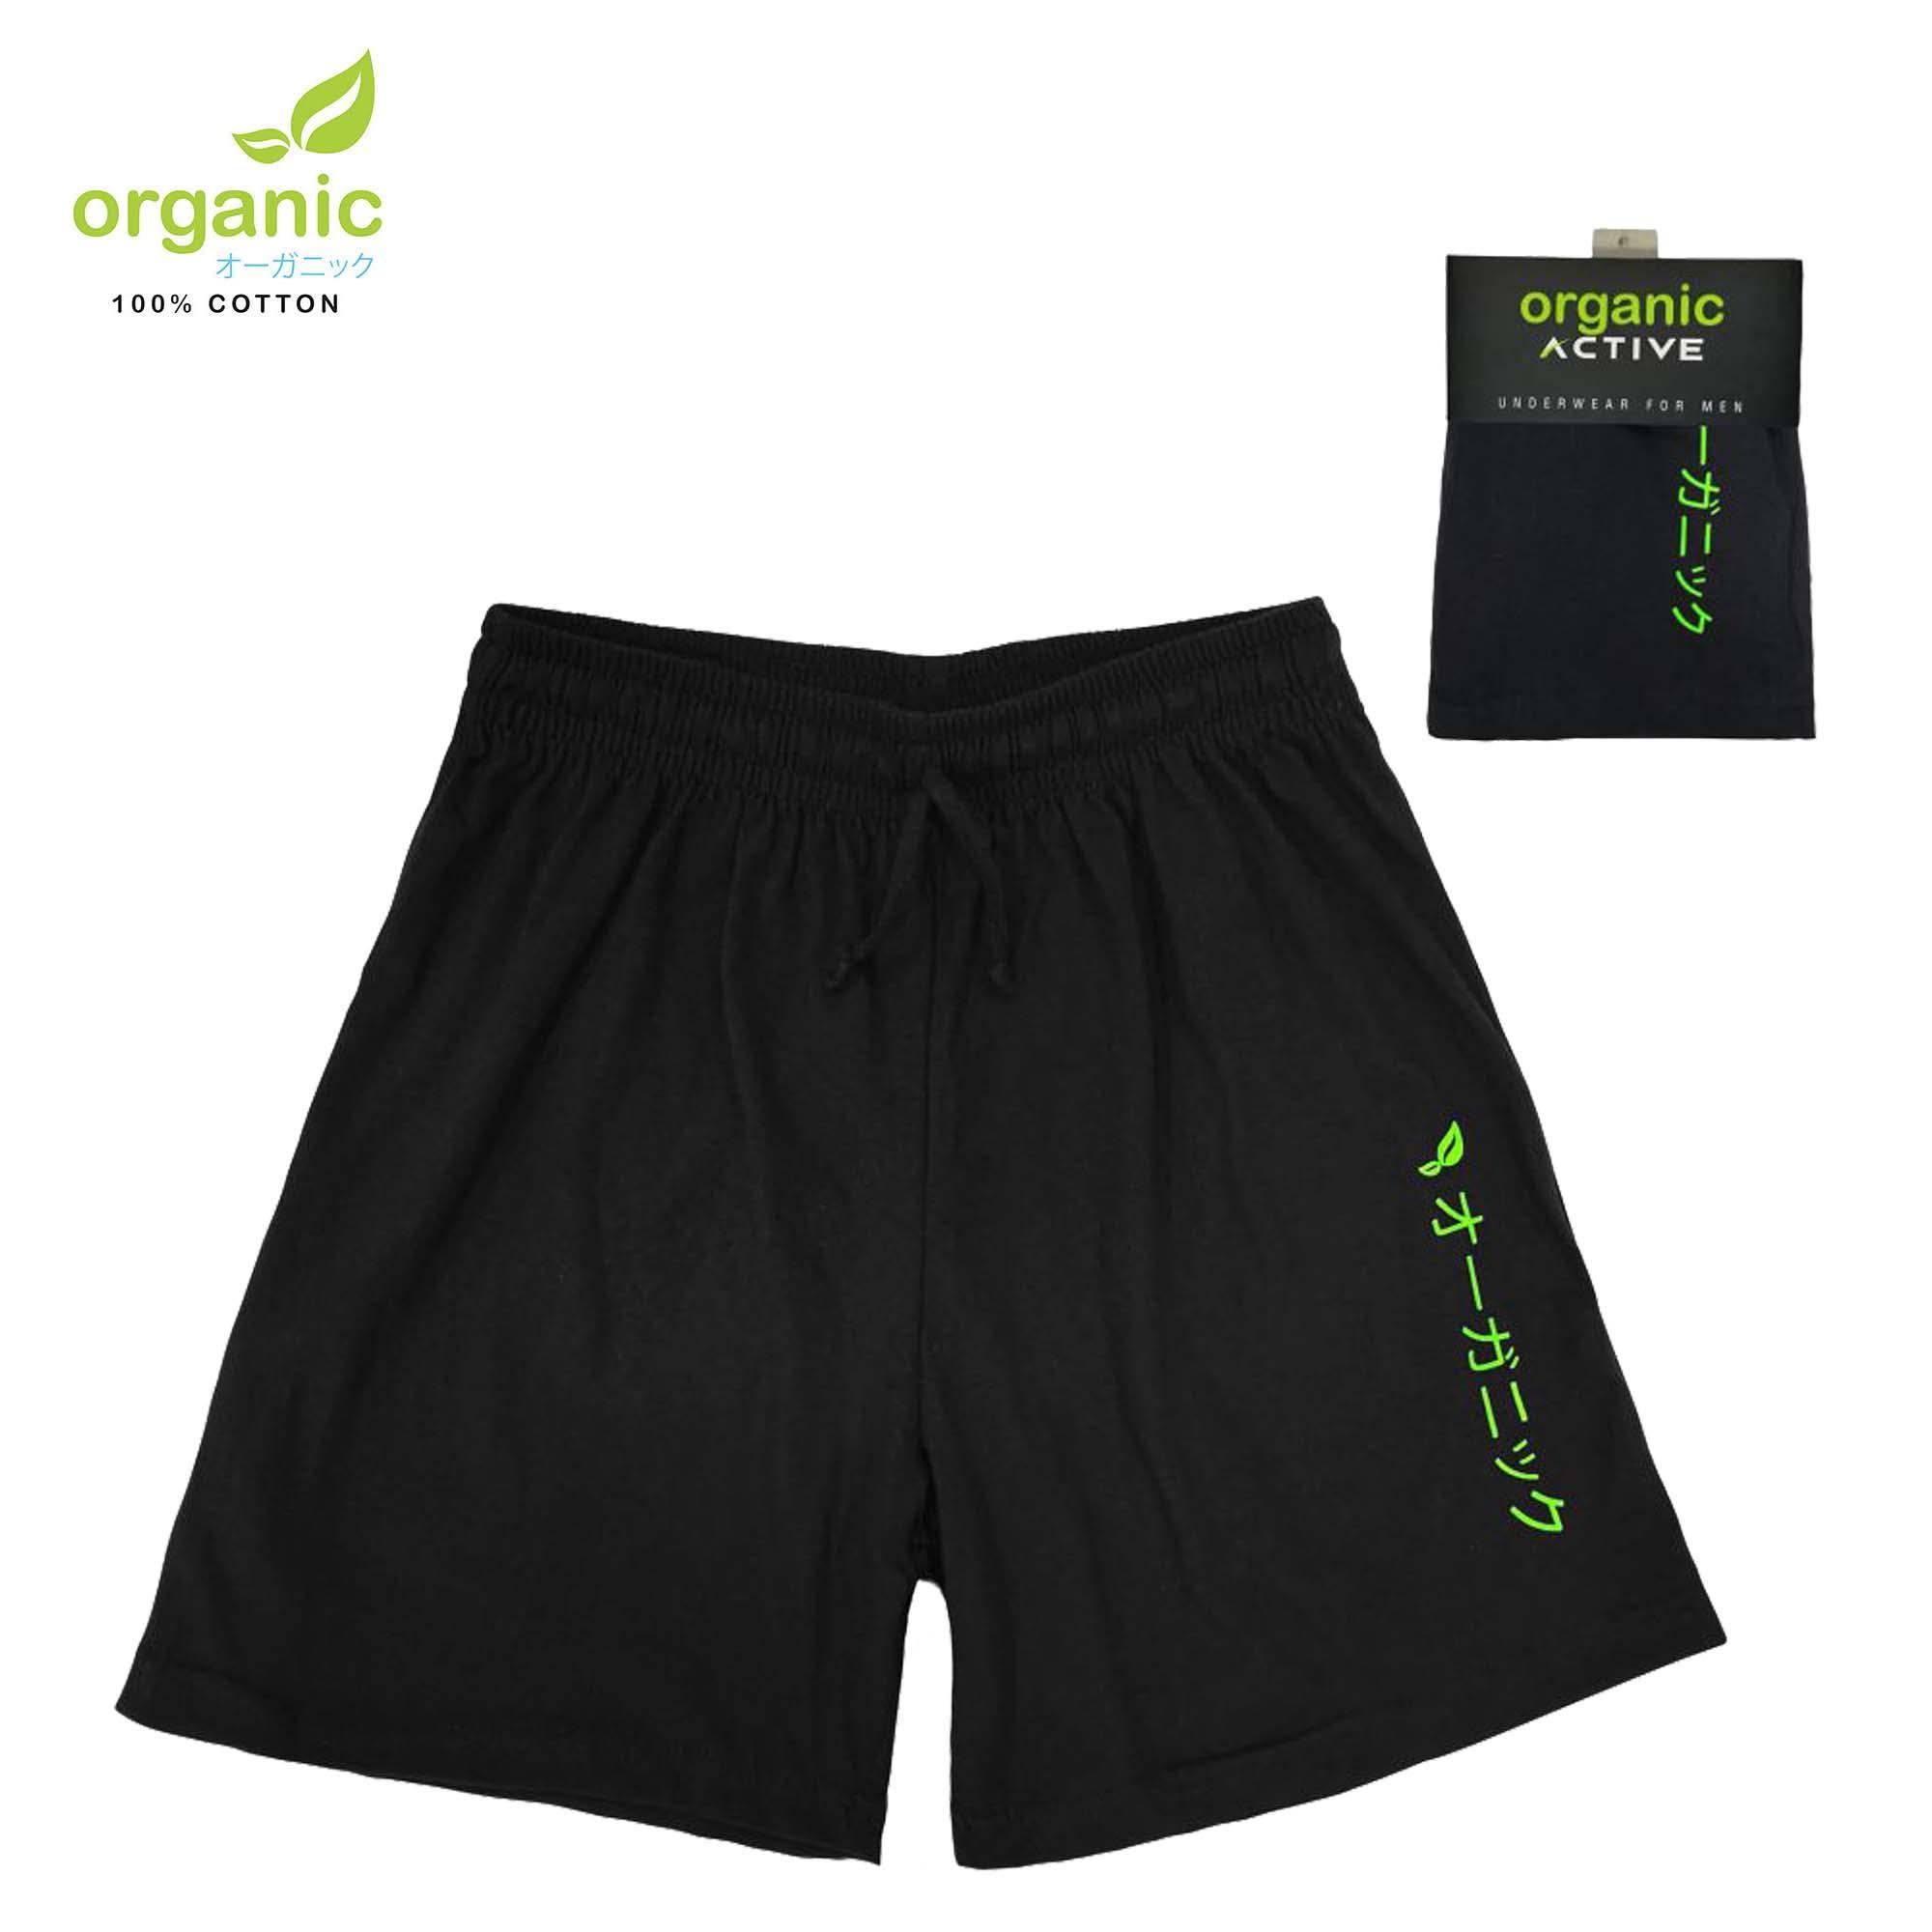 5ecf6a96a77 Organic Mens Jogger Shorts Training Short Gym sweat training running shorts  for men